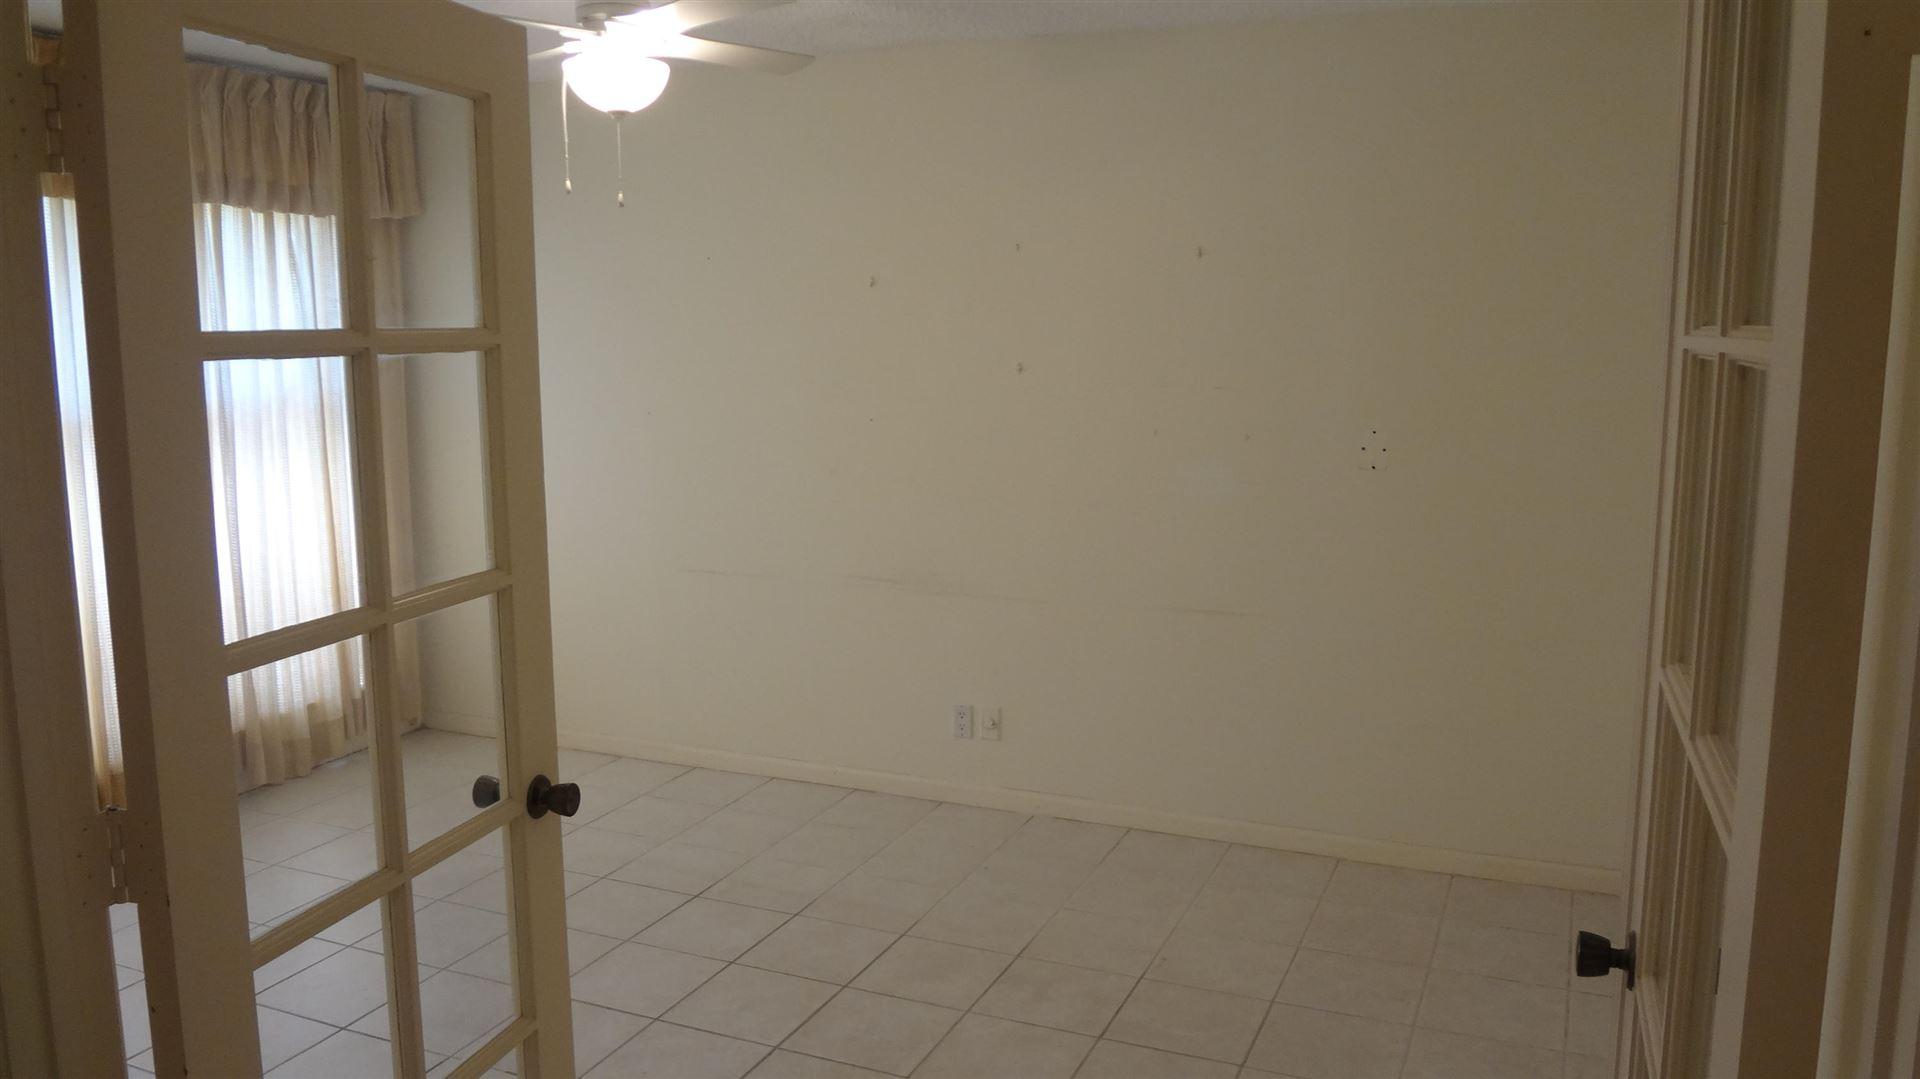 Photo of 46 Balfour Road, Palm Beach Gardens, FL 33418 (MLS # RX-10633841)